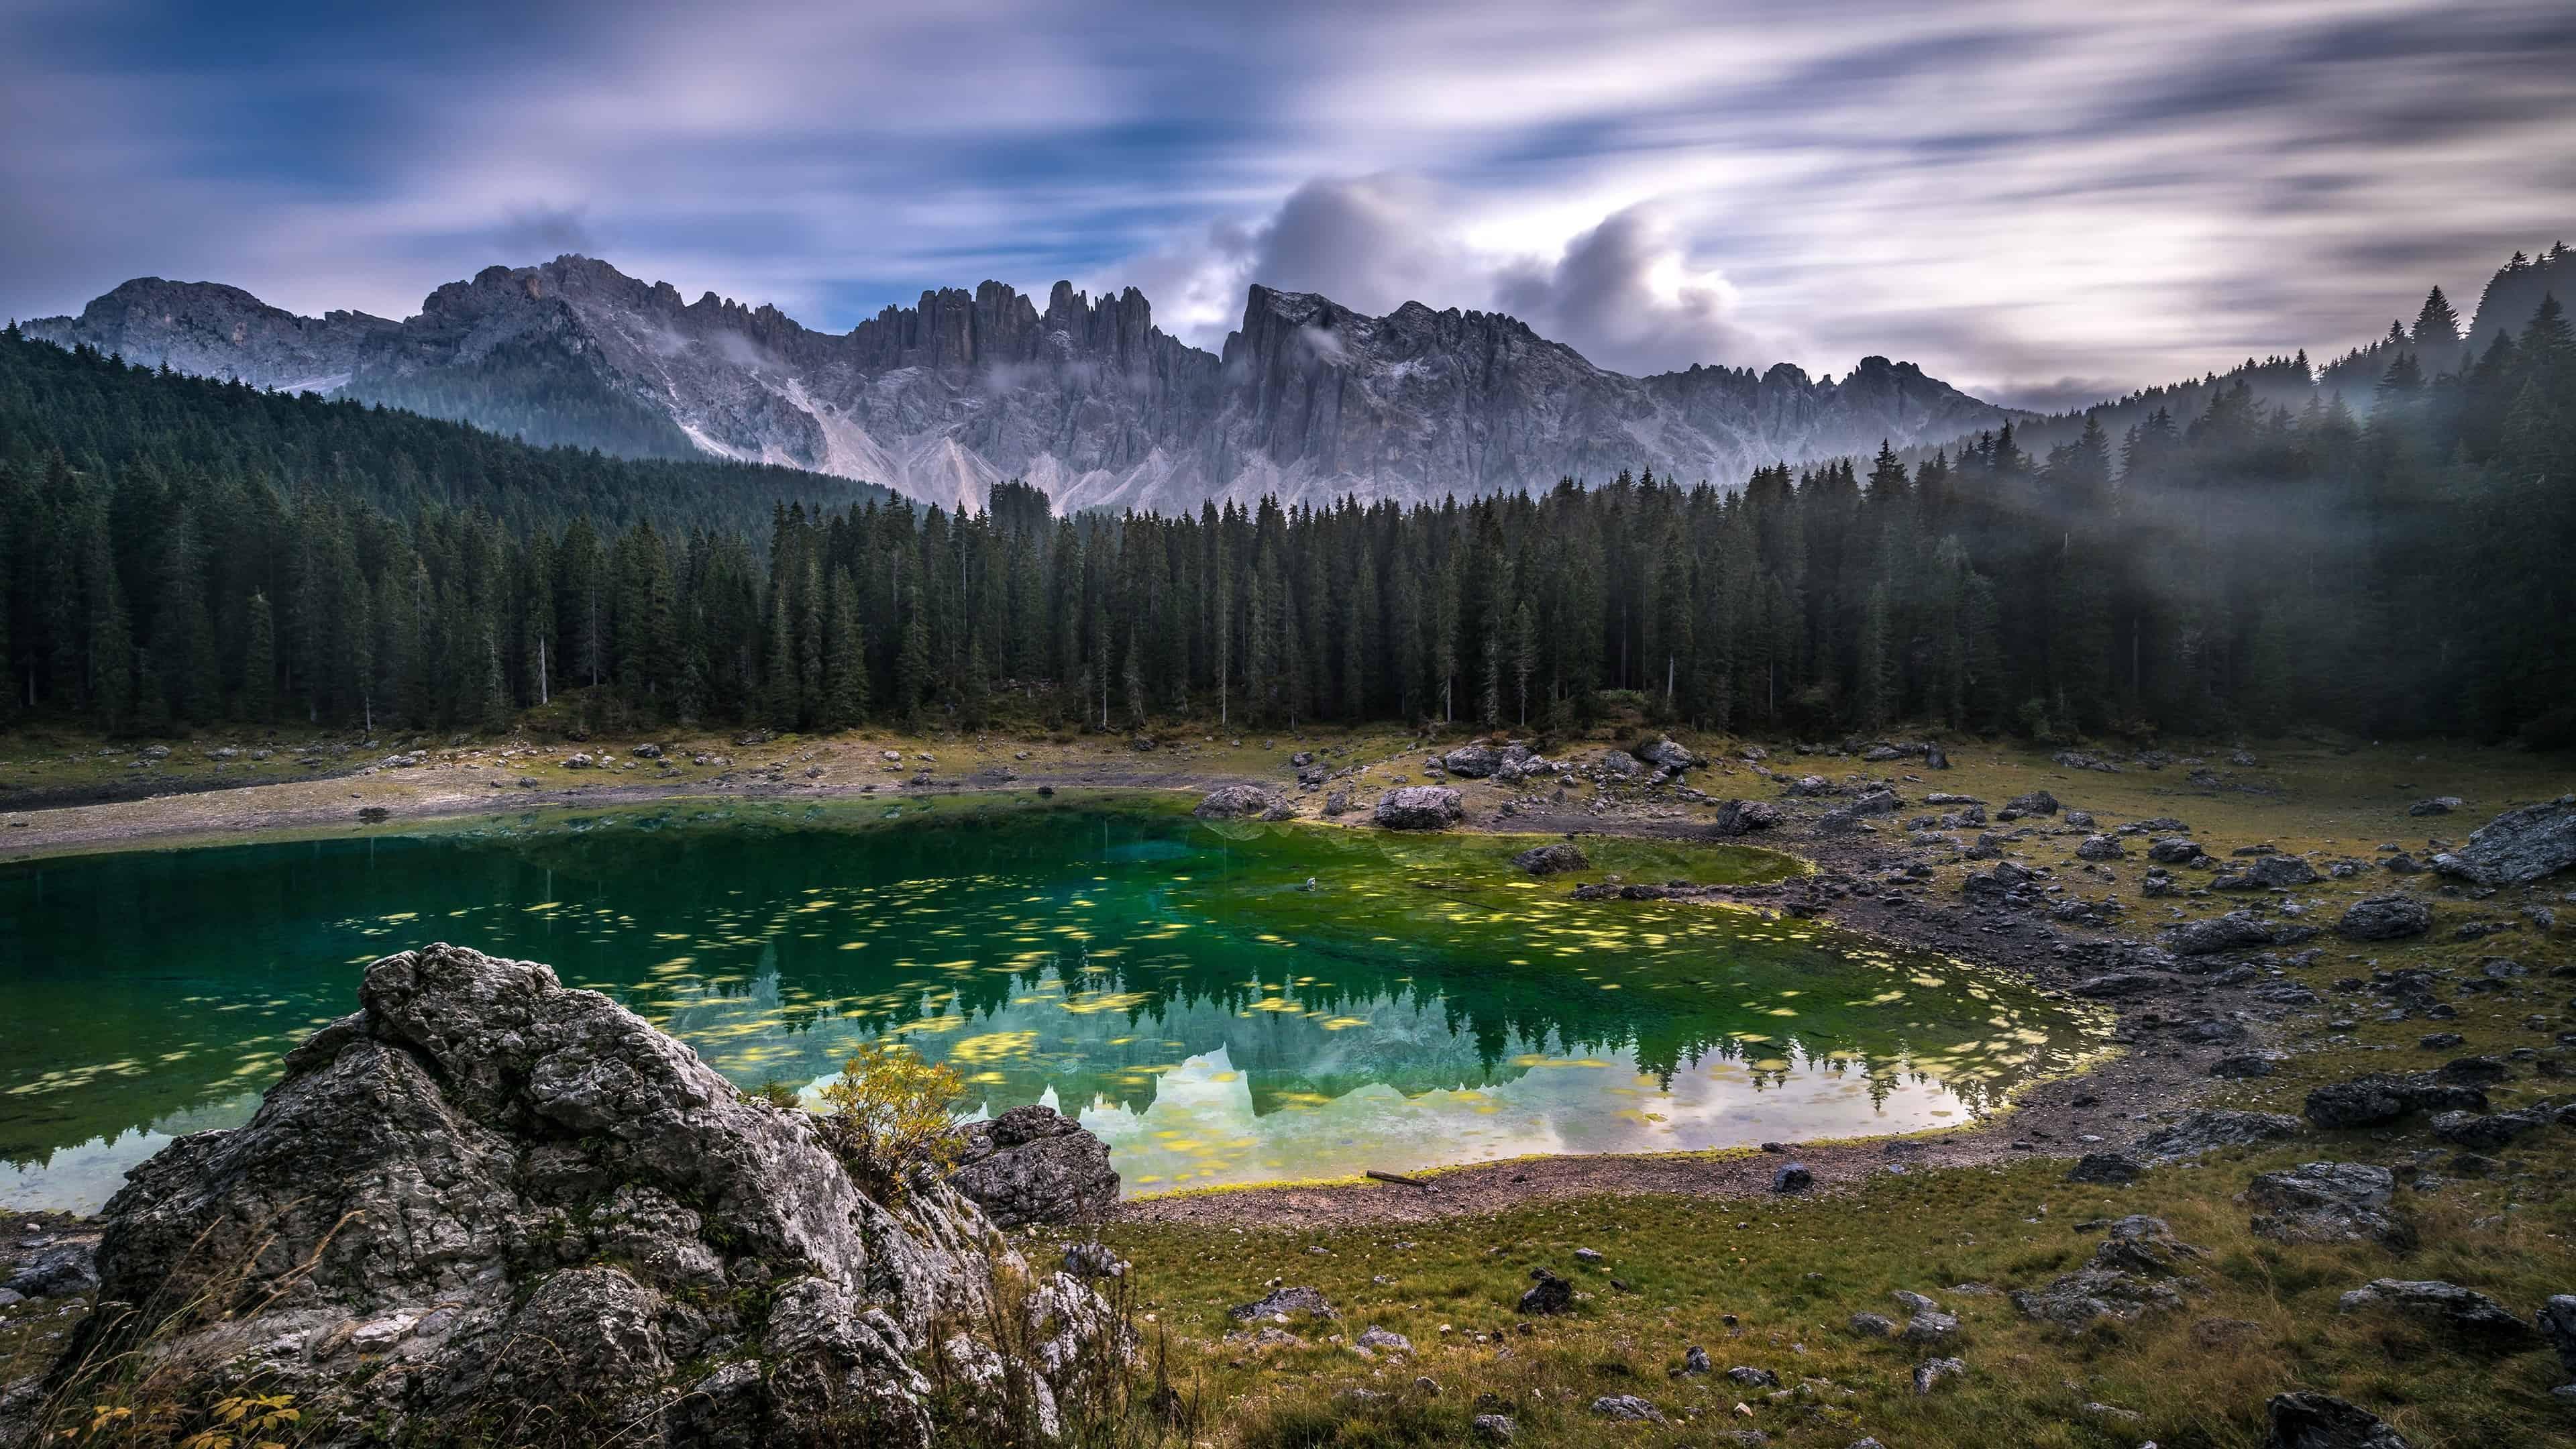 lake of carezza val d ega valley italy uhd 4k wallpaper